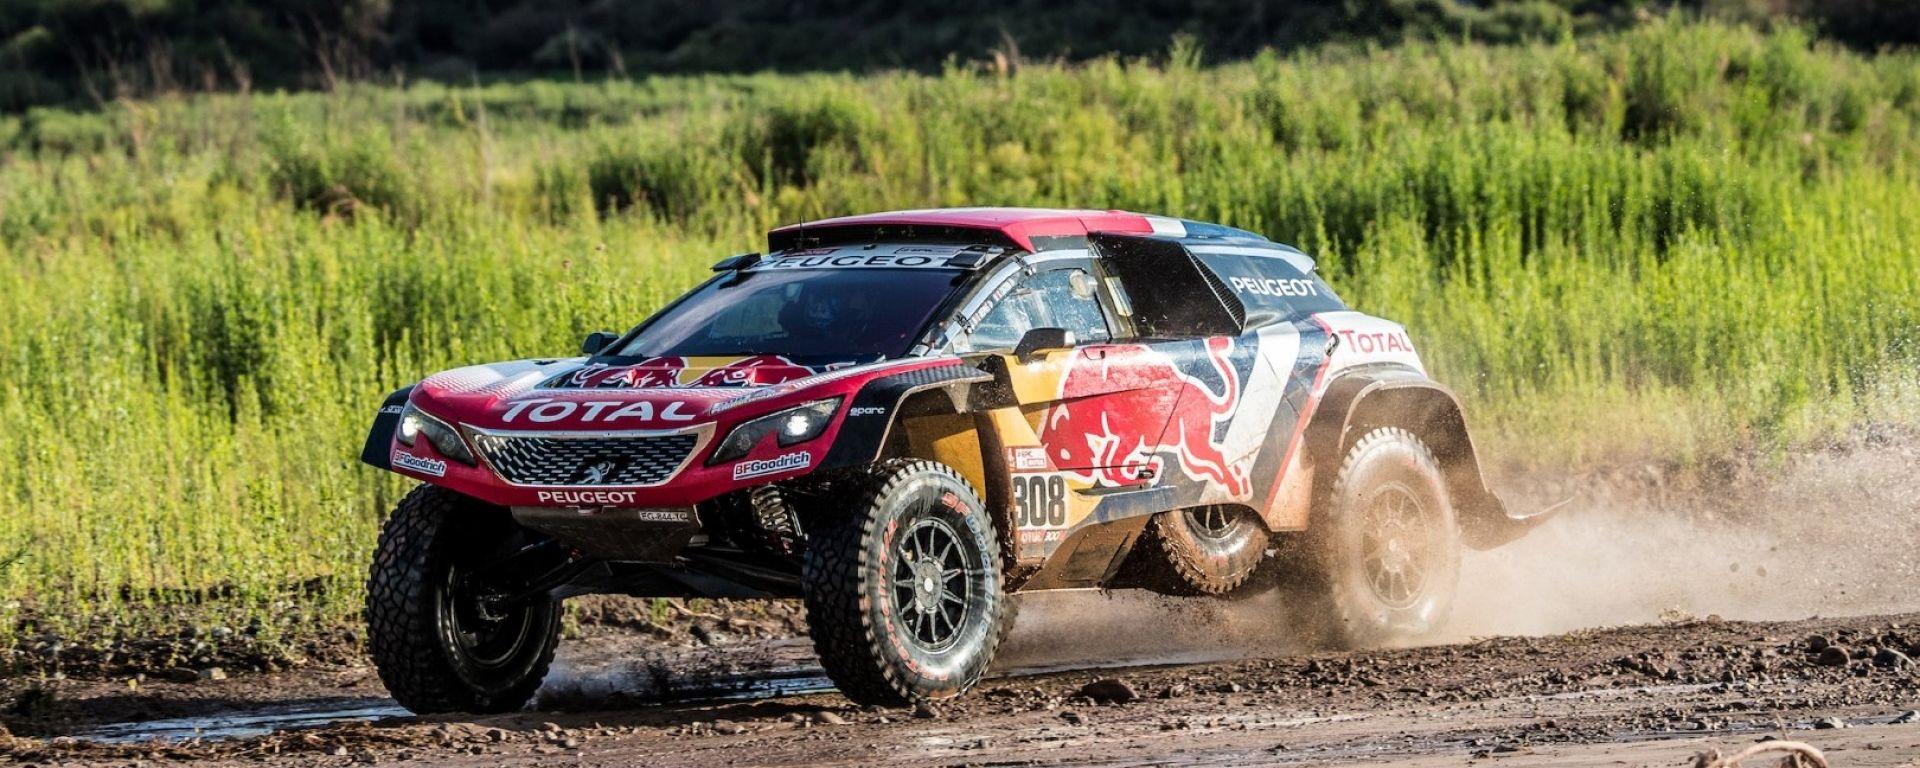 Dakar 2018: Peugeot controlla a pochi giorni dal traguardo